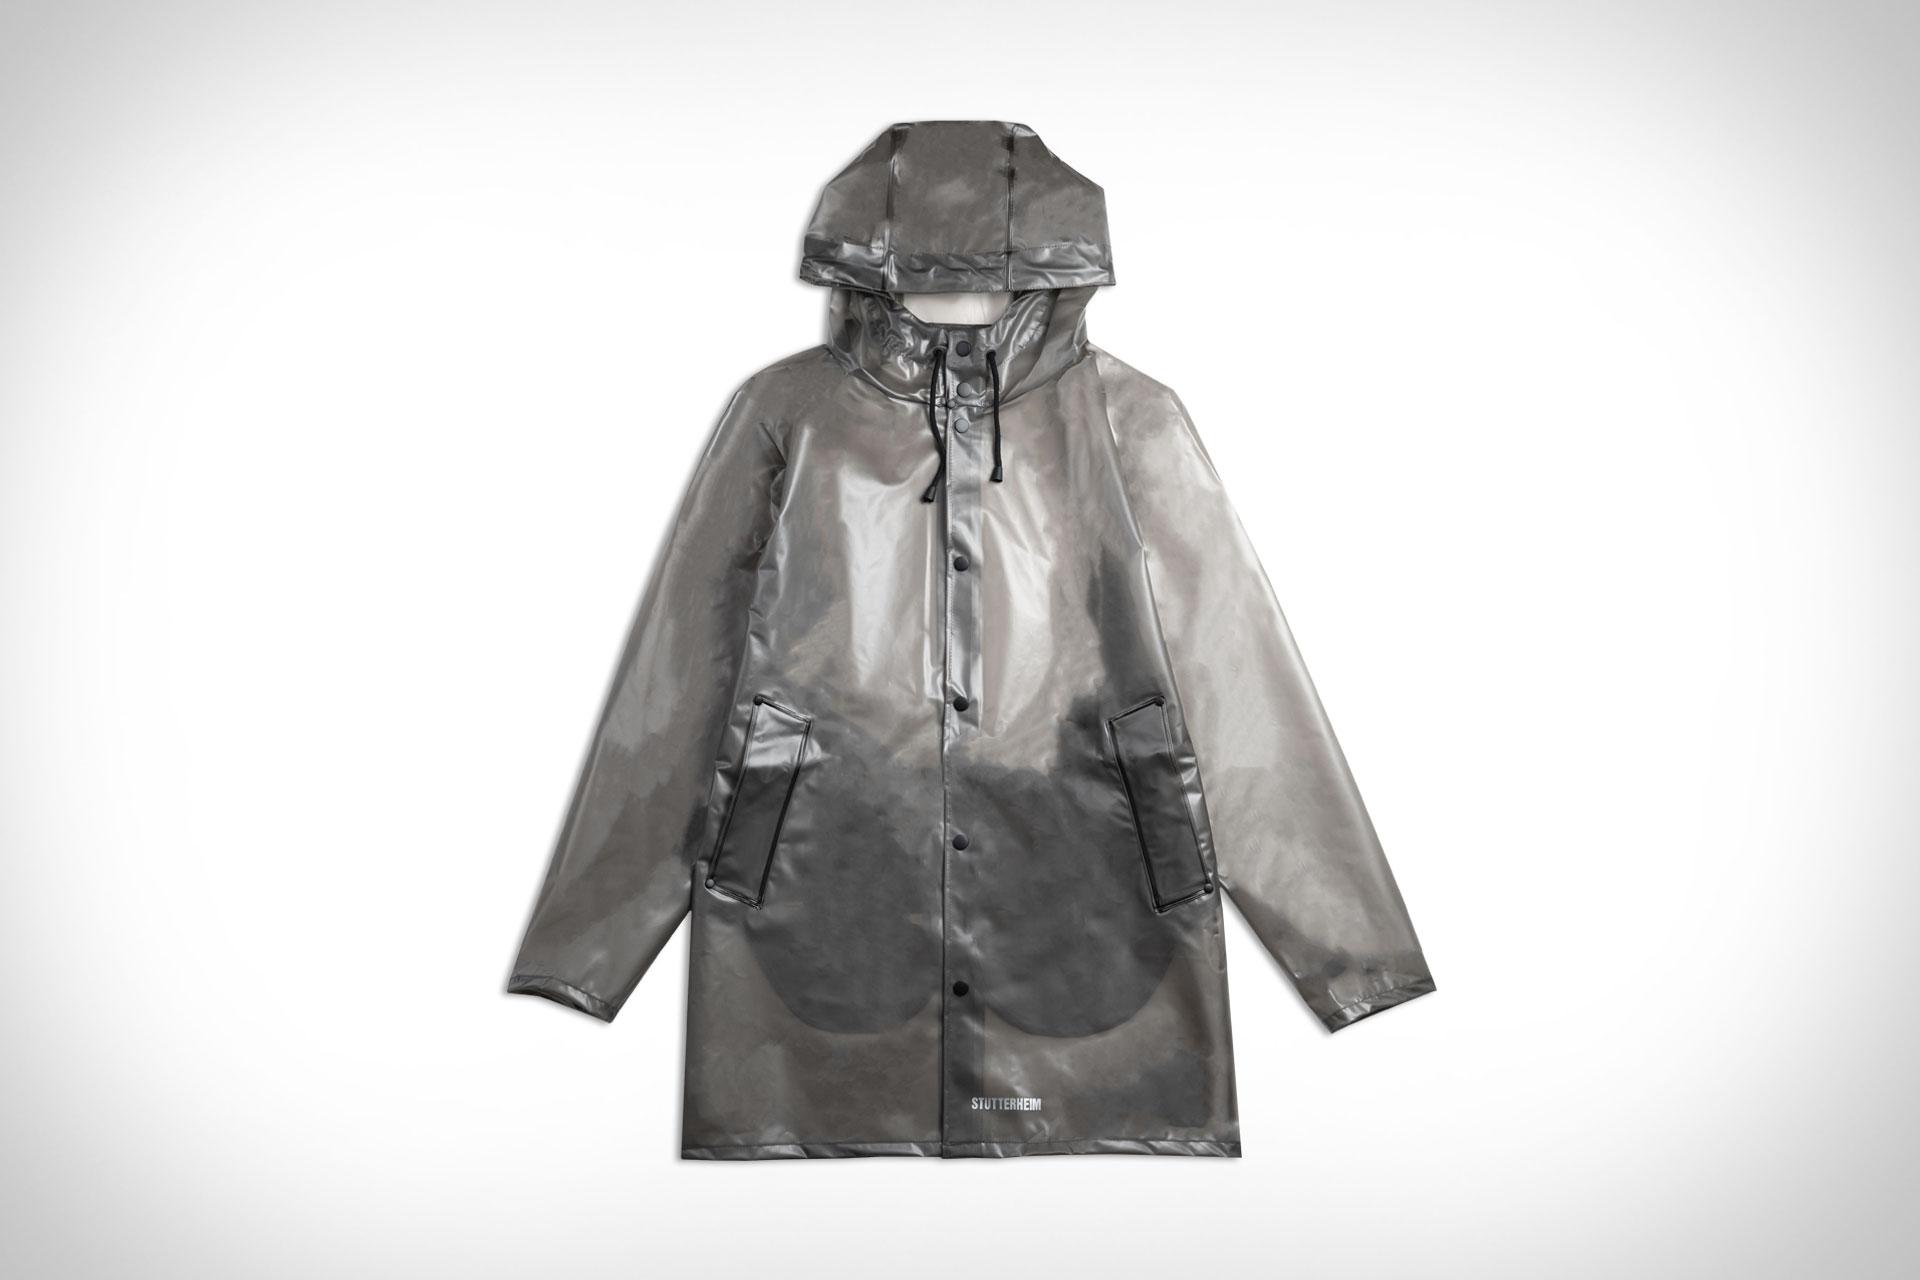 8a8f06bba Stutterheim Stockholm Smoke Rain Jacket